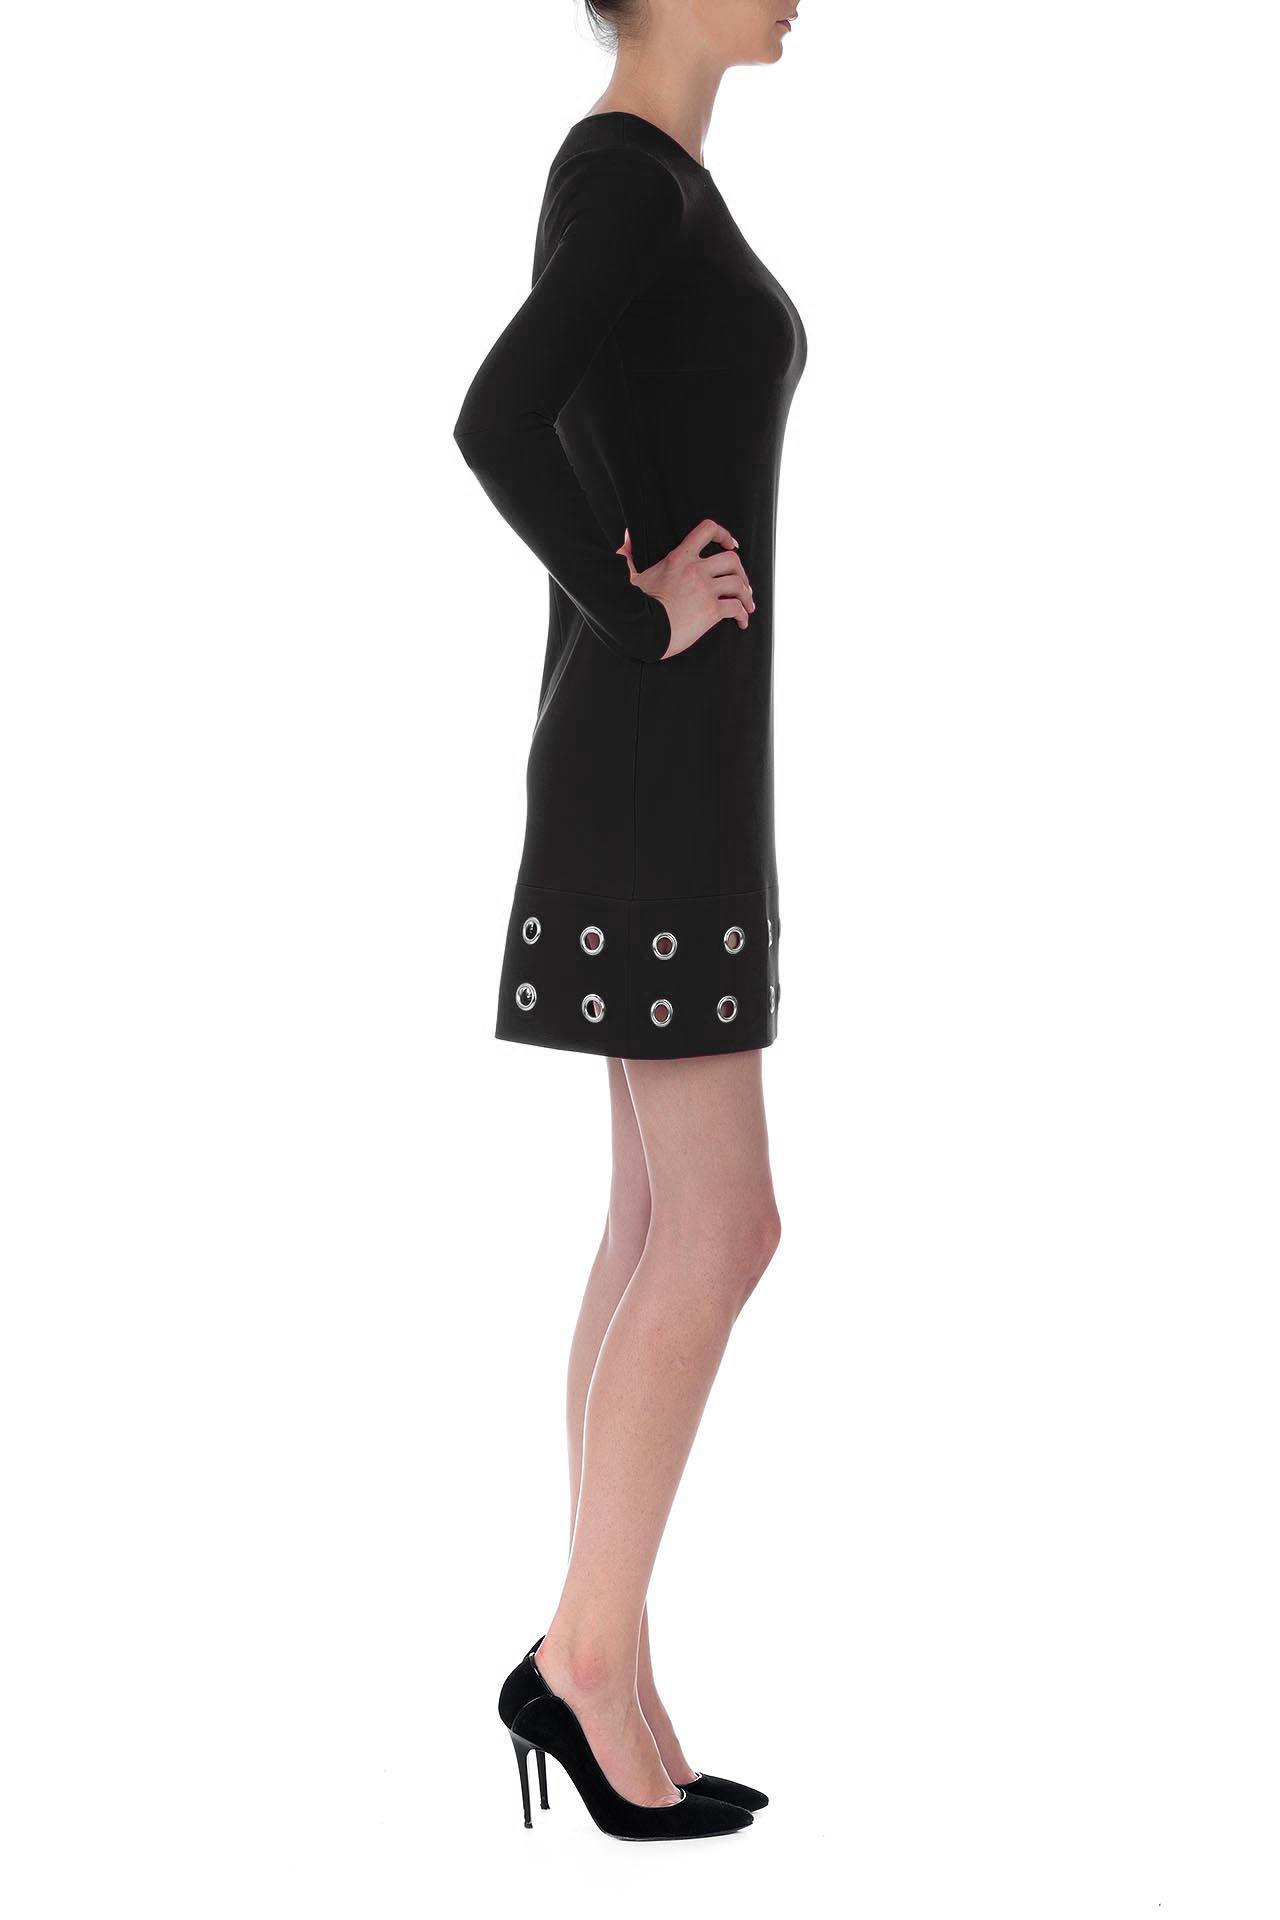 DRESS OKI BLACK 5